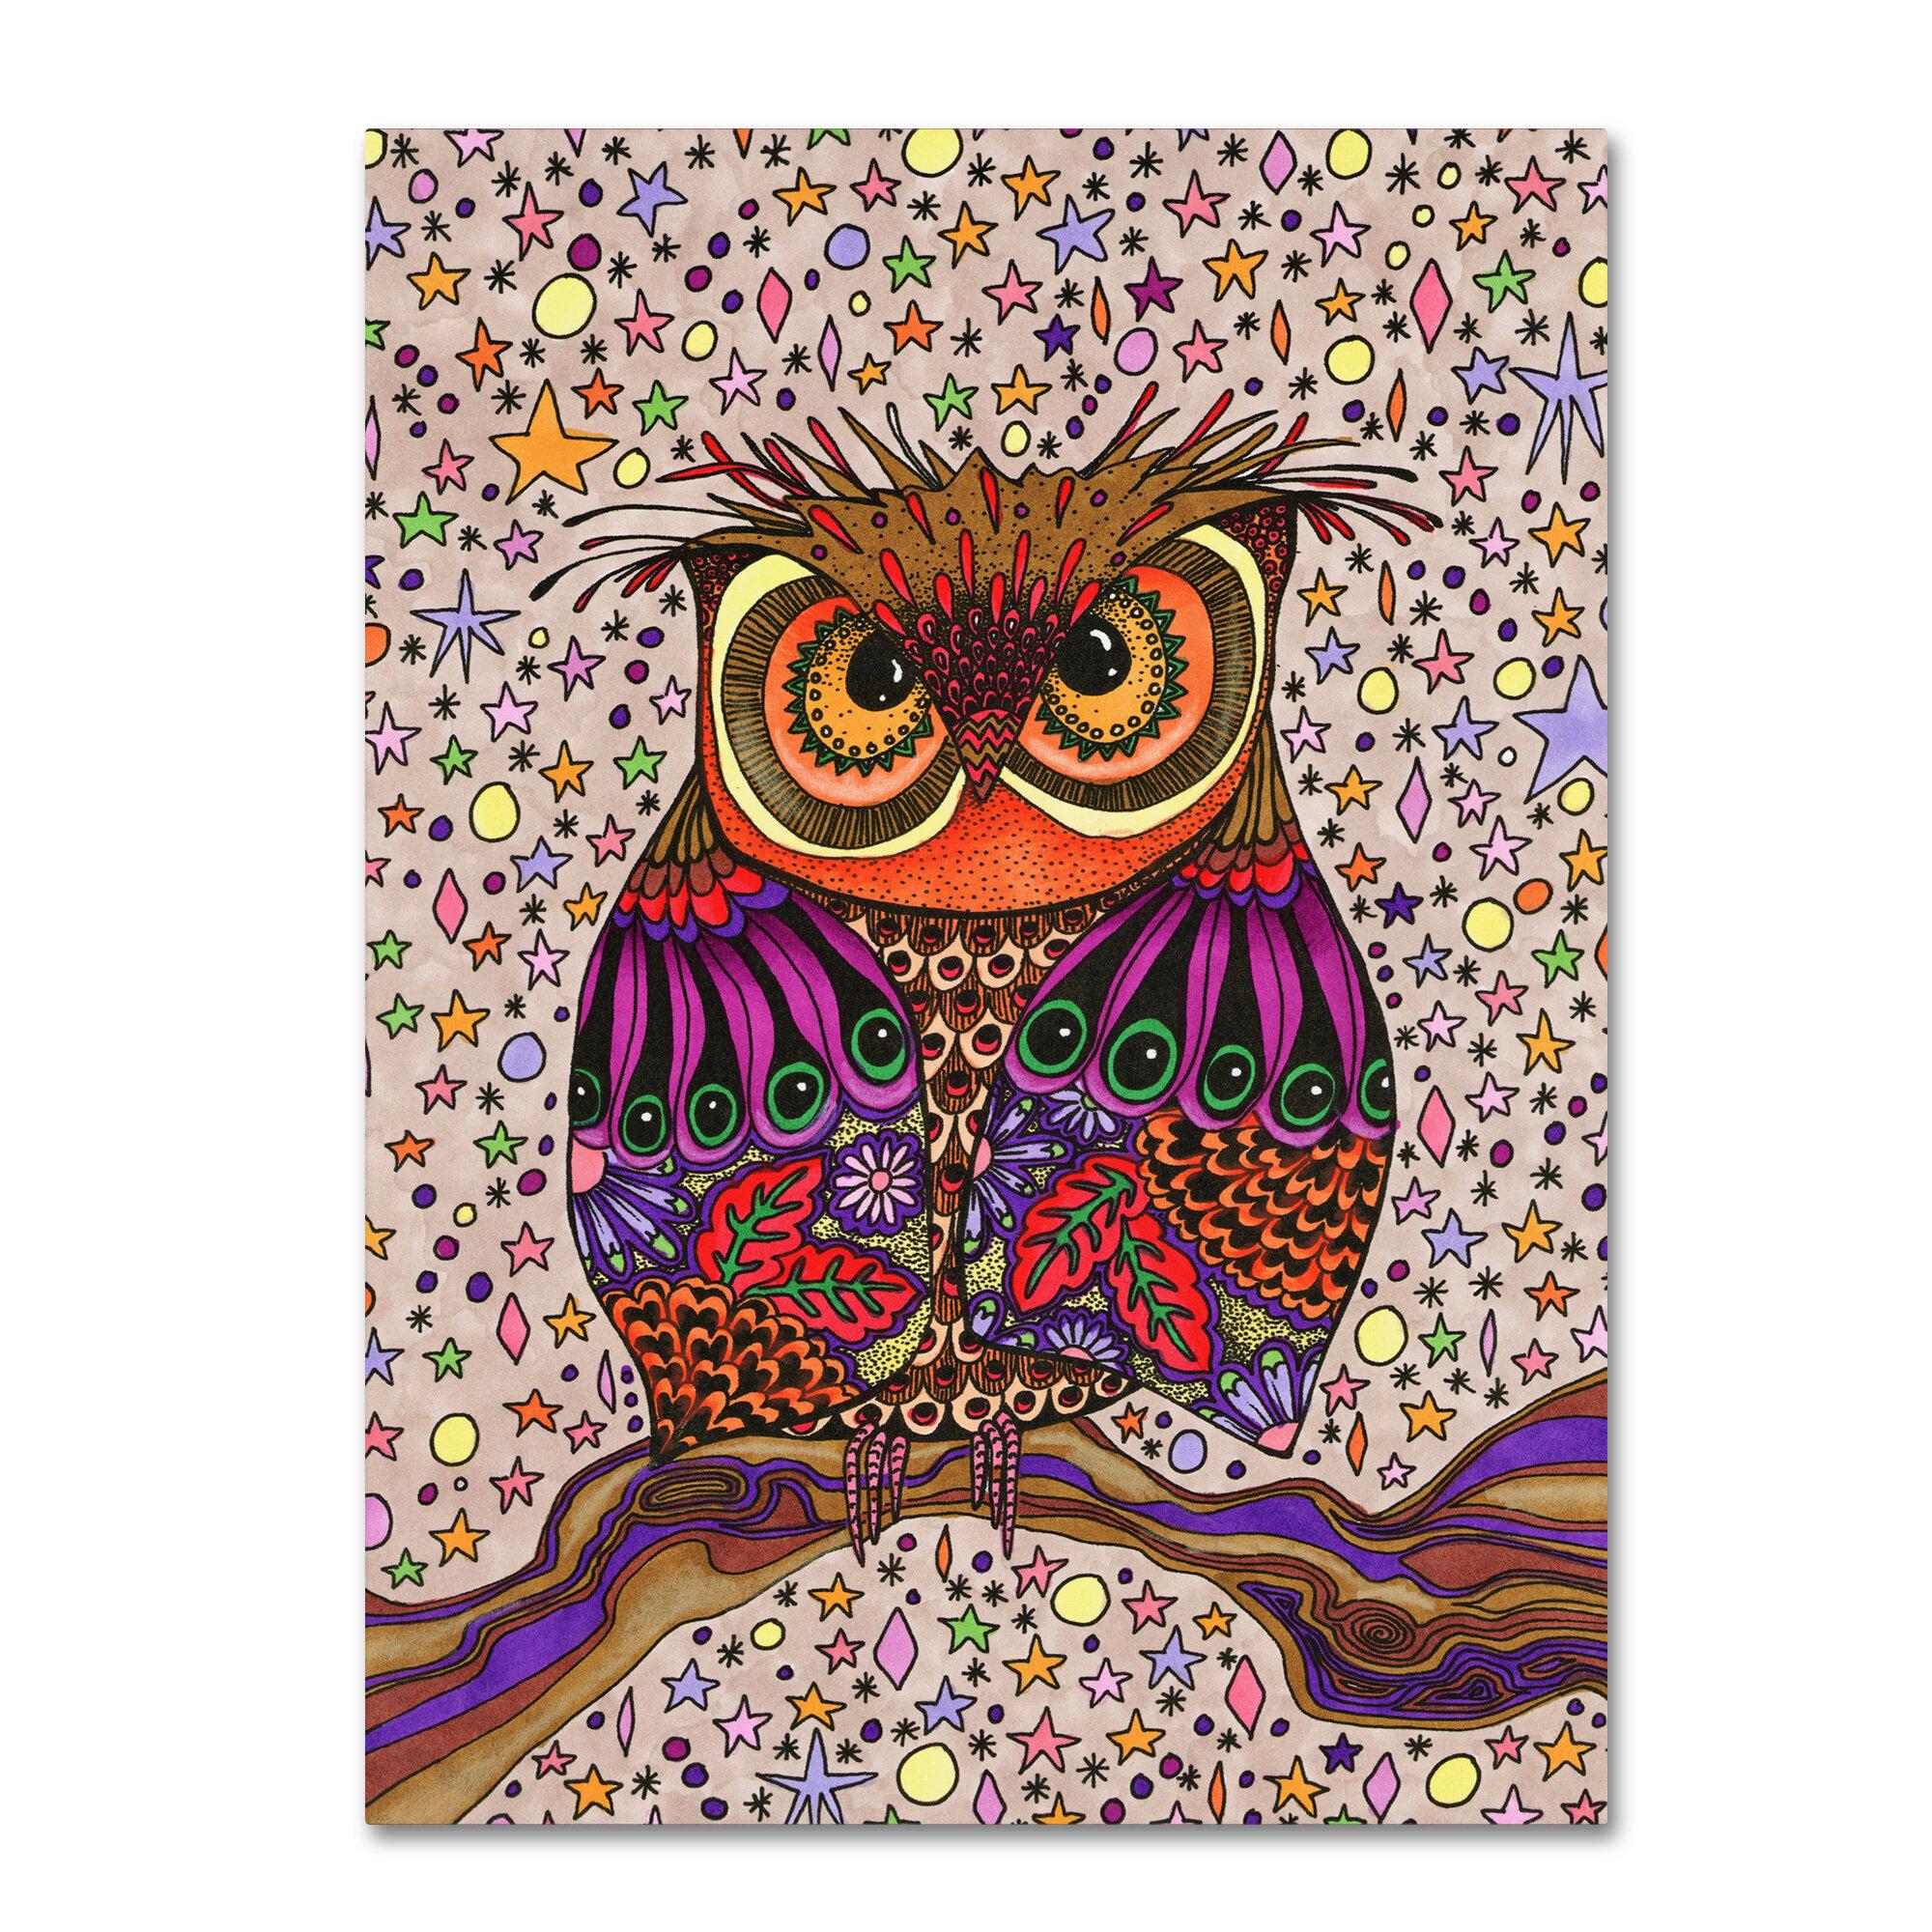 Trademark Art Starry Night Owl Graphic Art Print On Wrapped Canvas Wayfair